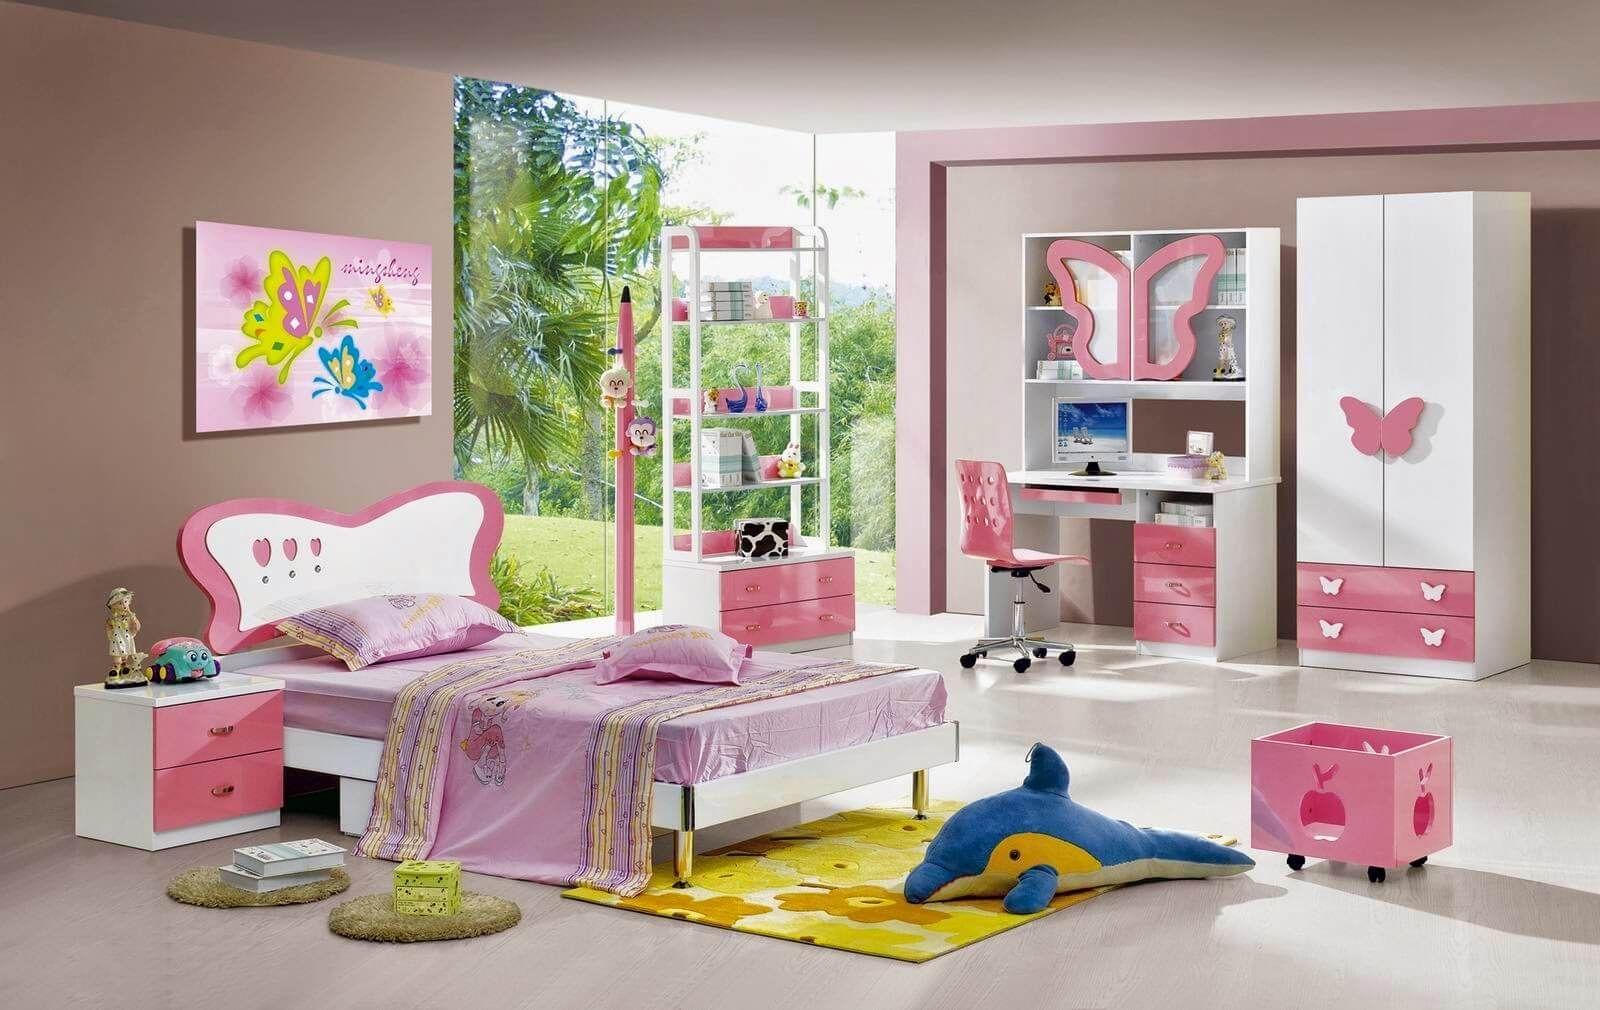 Amusing Kids Room Decorating With Style And Comfort Kids Interior Room Modern Kids Bedroom Kids Room Interior Design